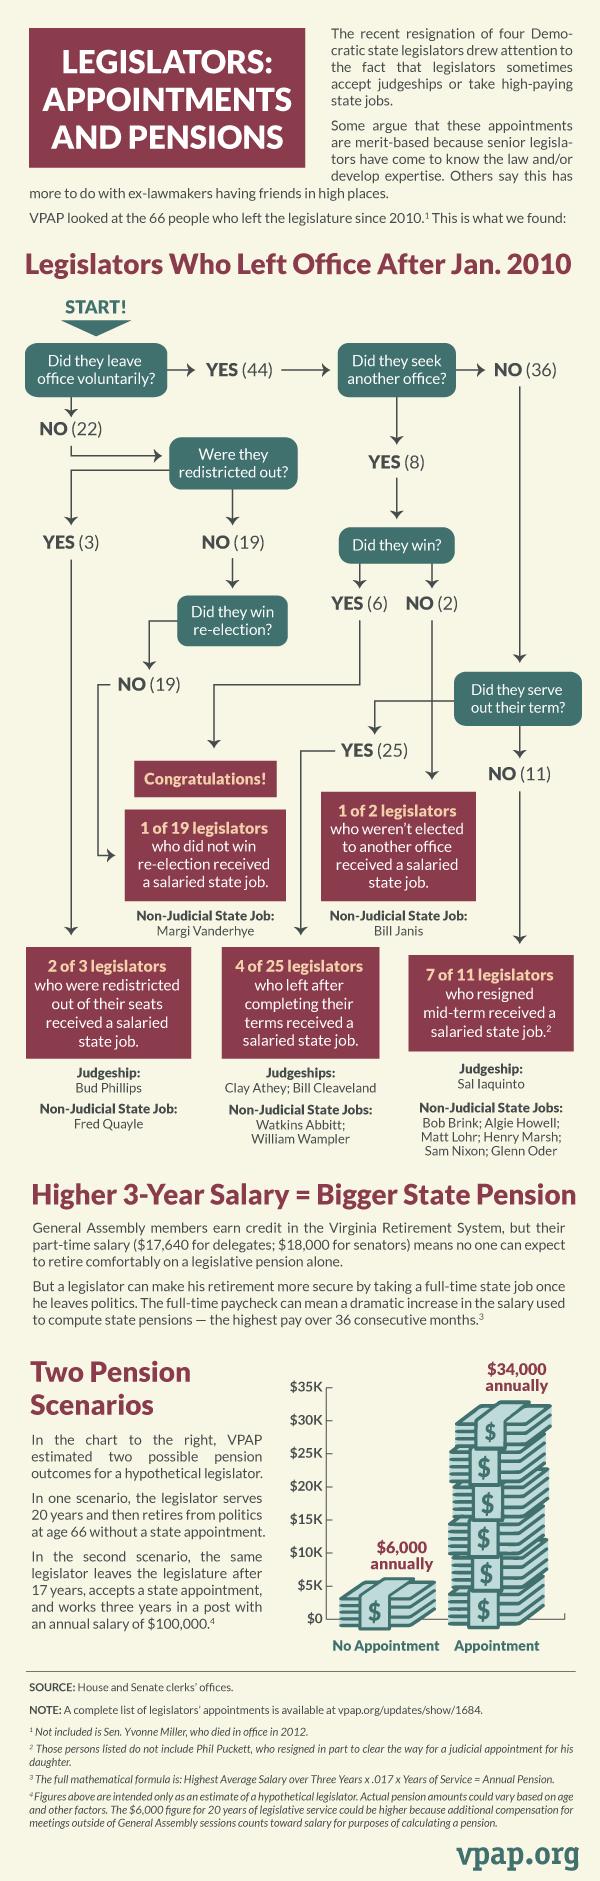 Legislators: Appointment and Pensions